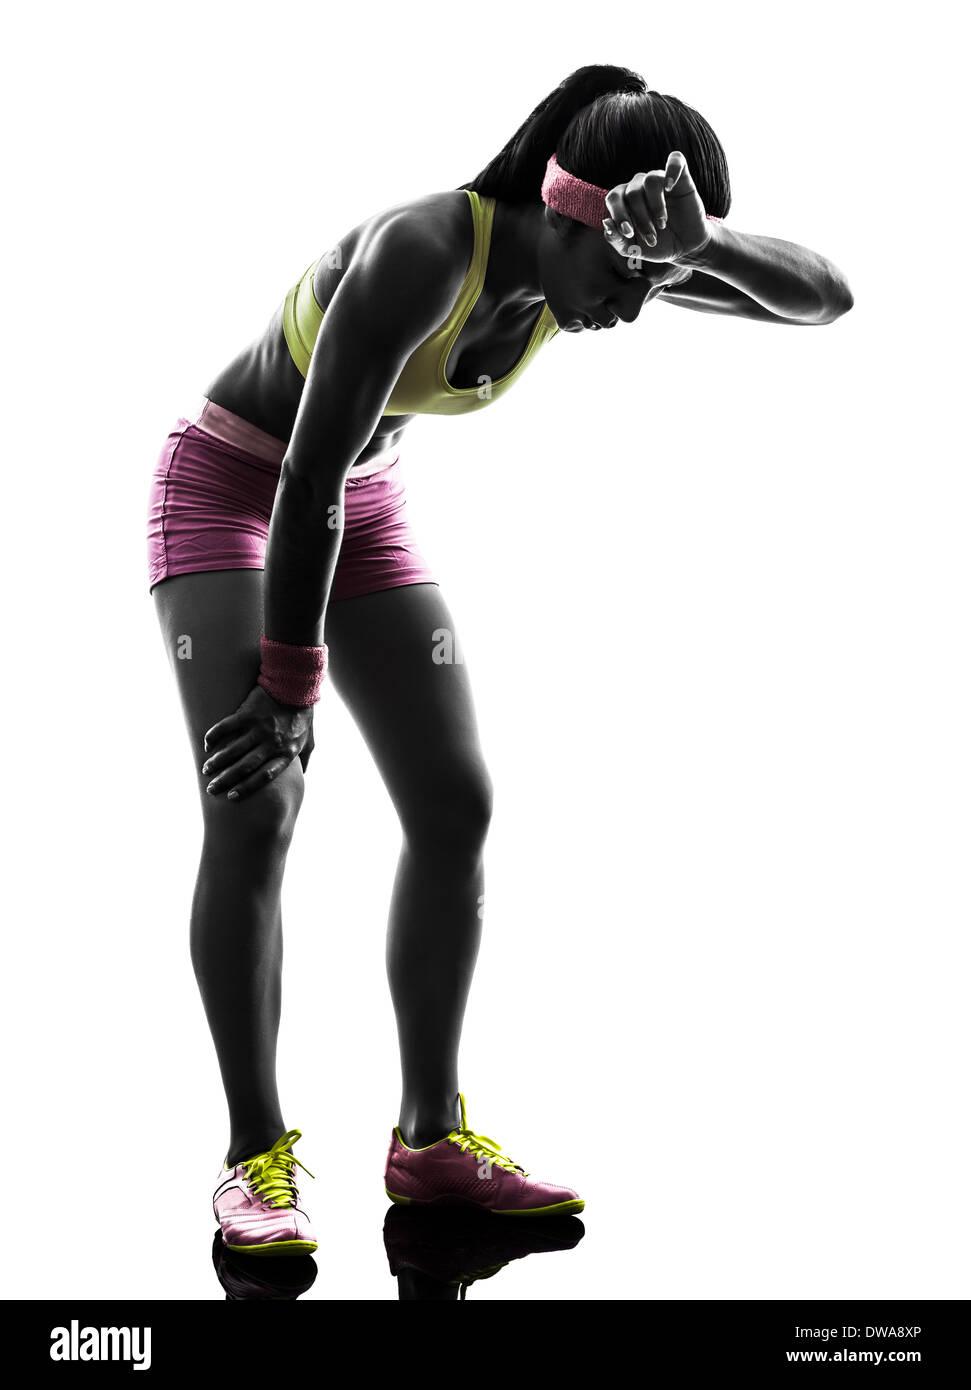 one  woman runner running tired breathless in silhouette on white background - Stock Image